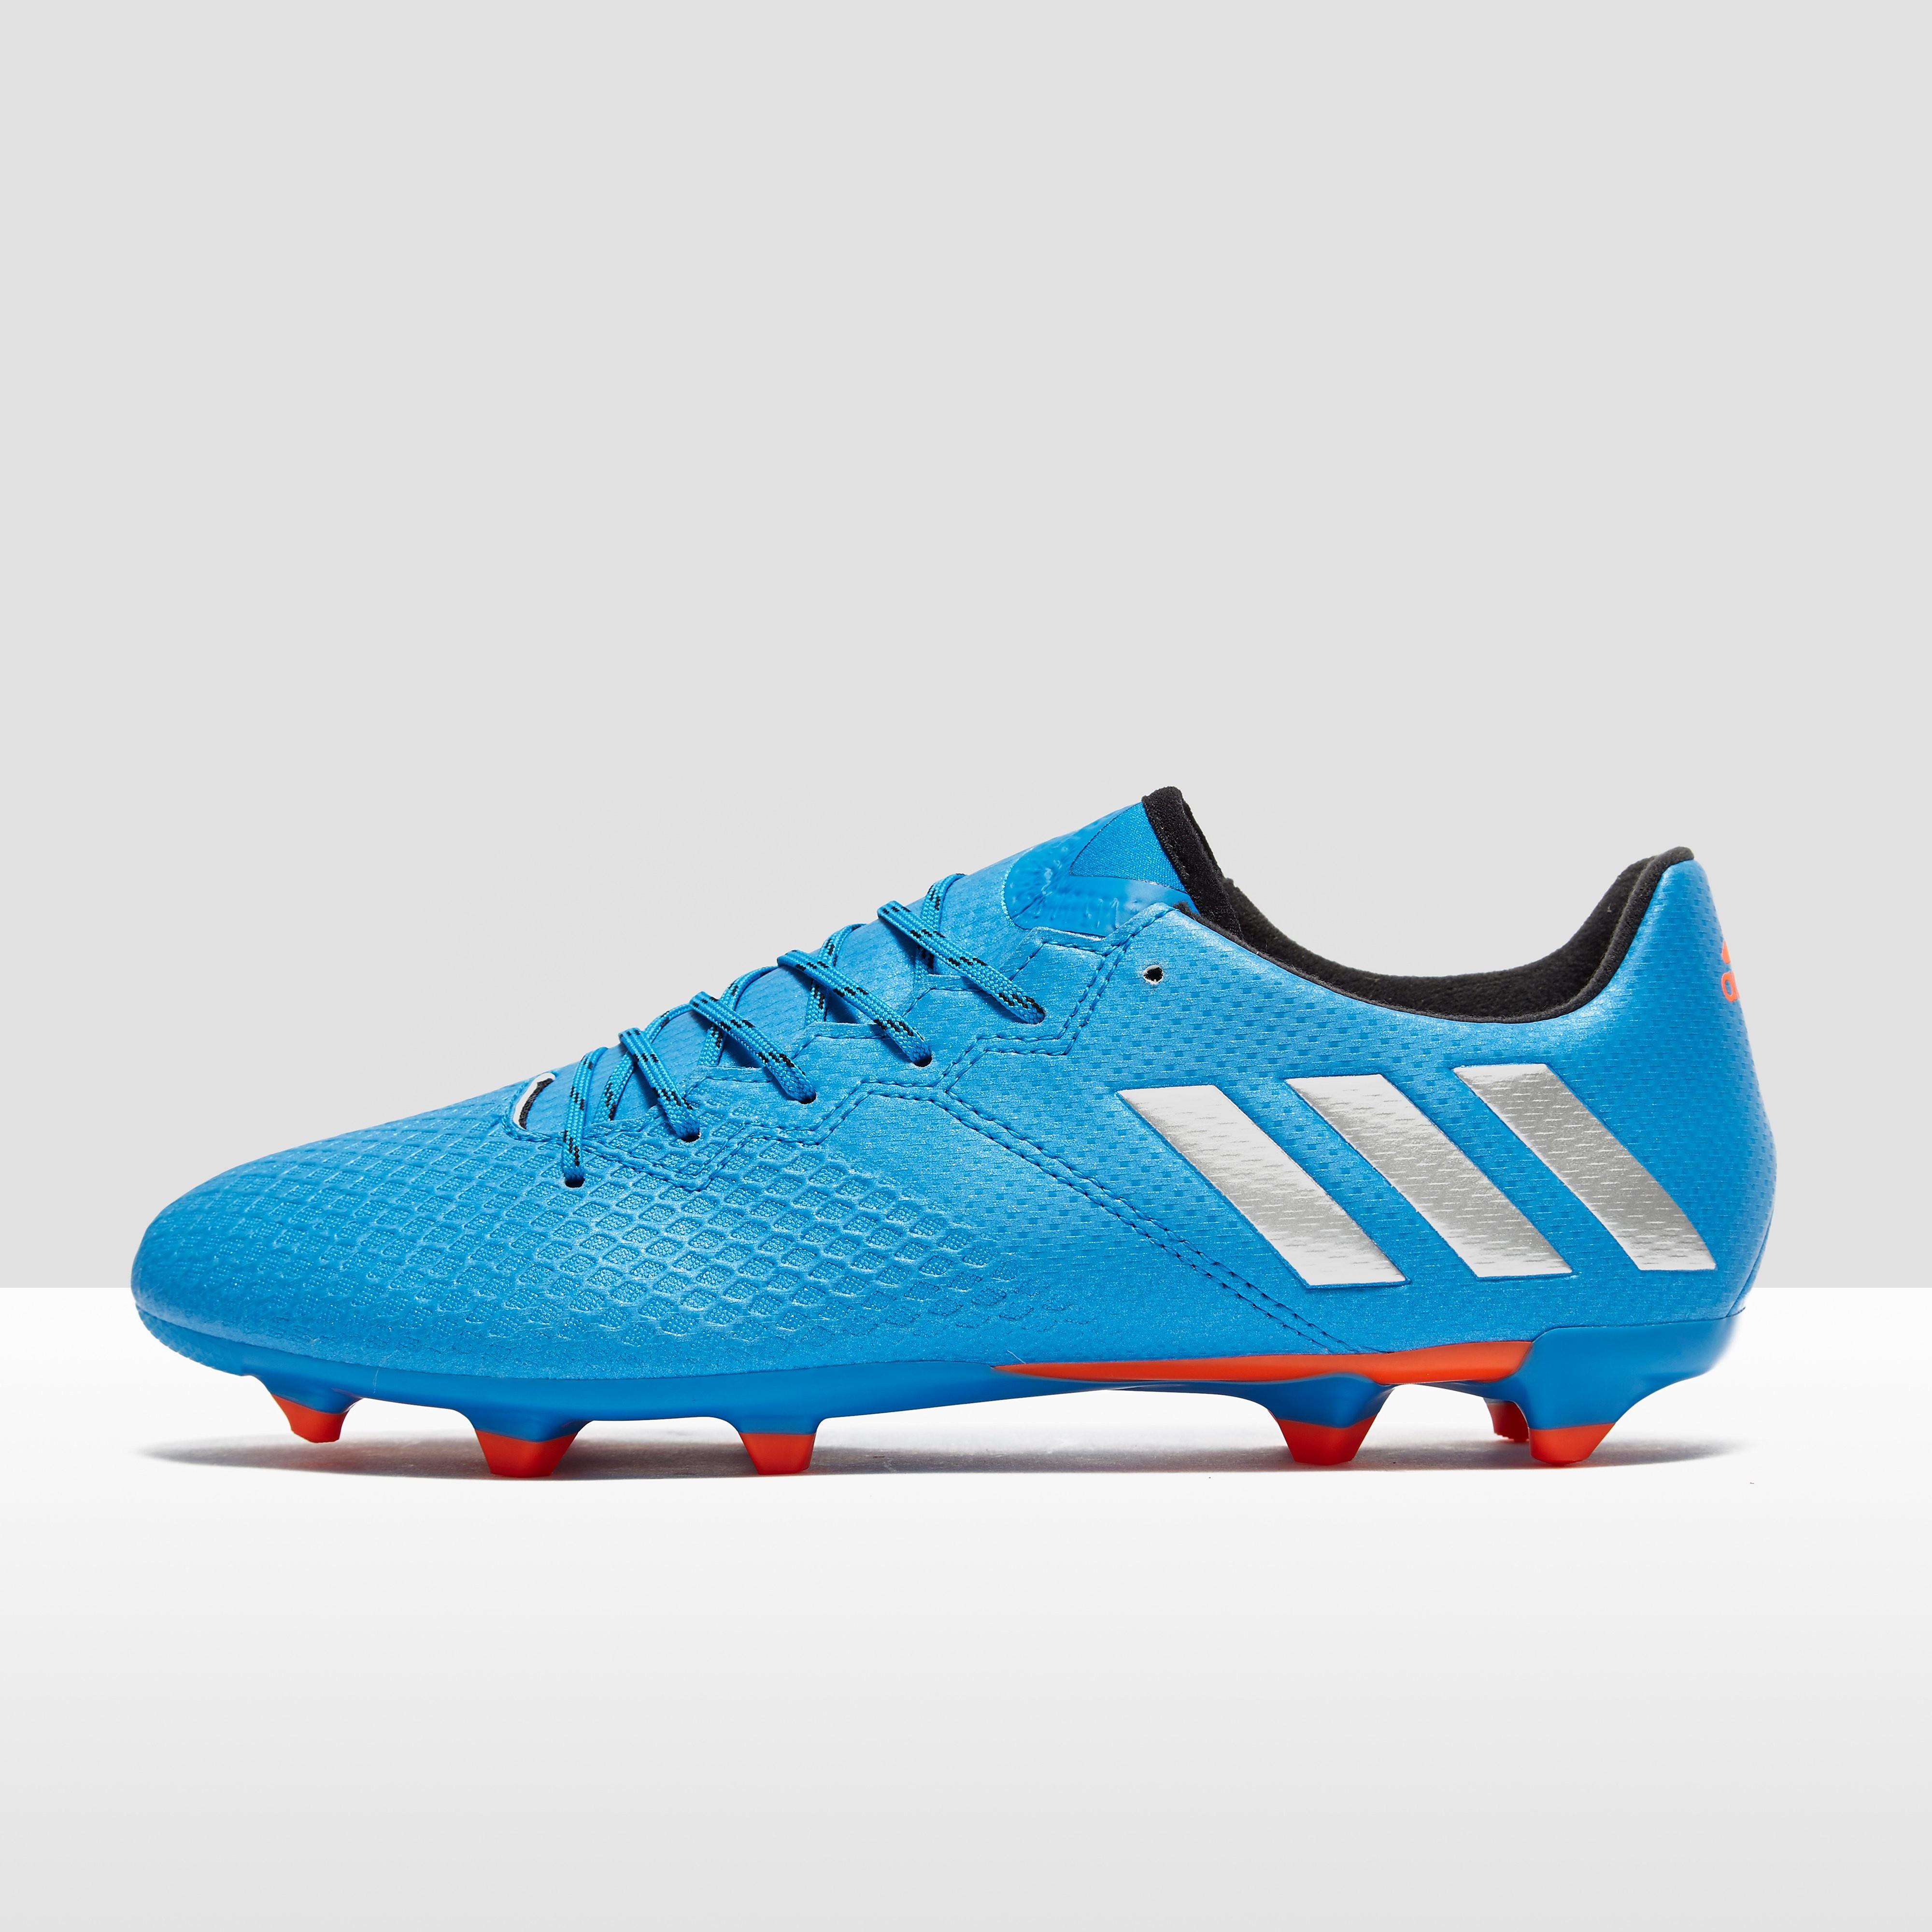 adidas Messi 16.3 Firm Ground